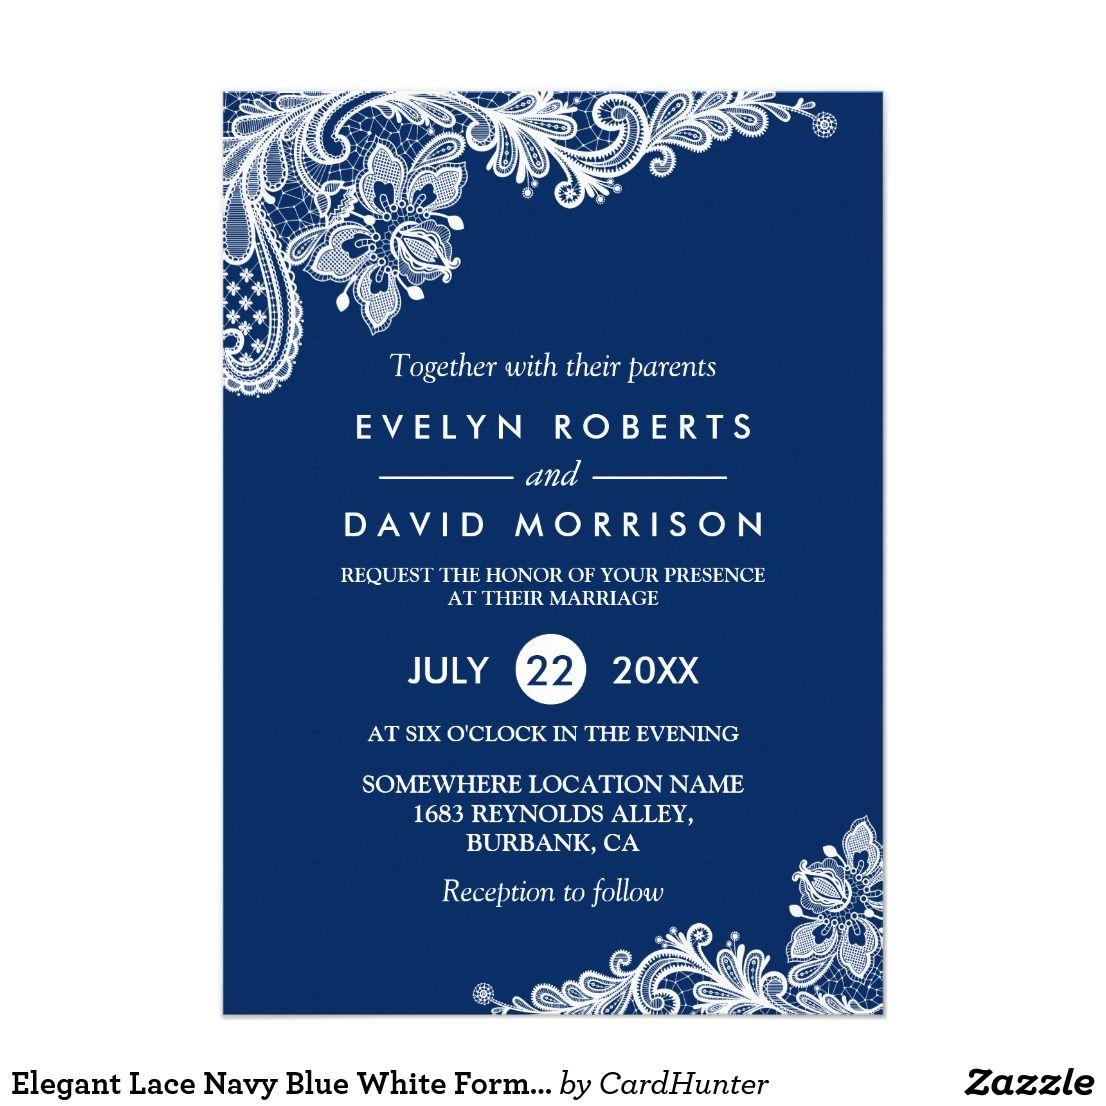 Elegant lace navy blue white formal wedding card formal wedding elegant lace navy blue white formal wedding card stopboris Gallery